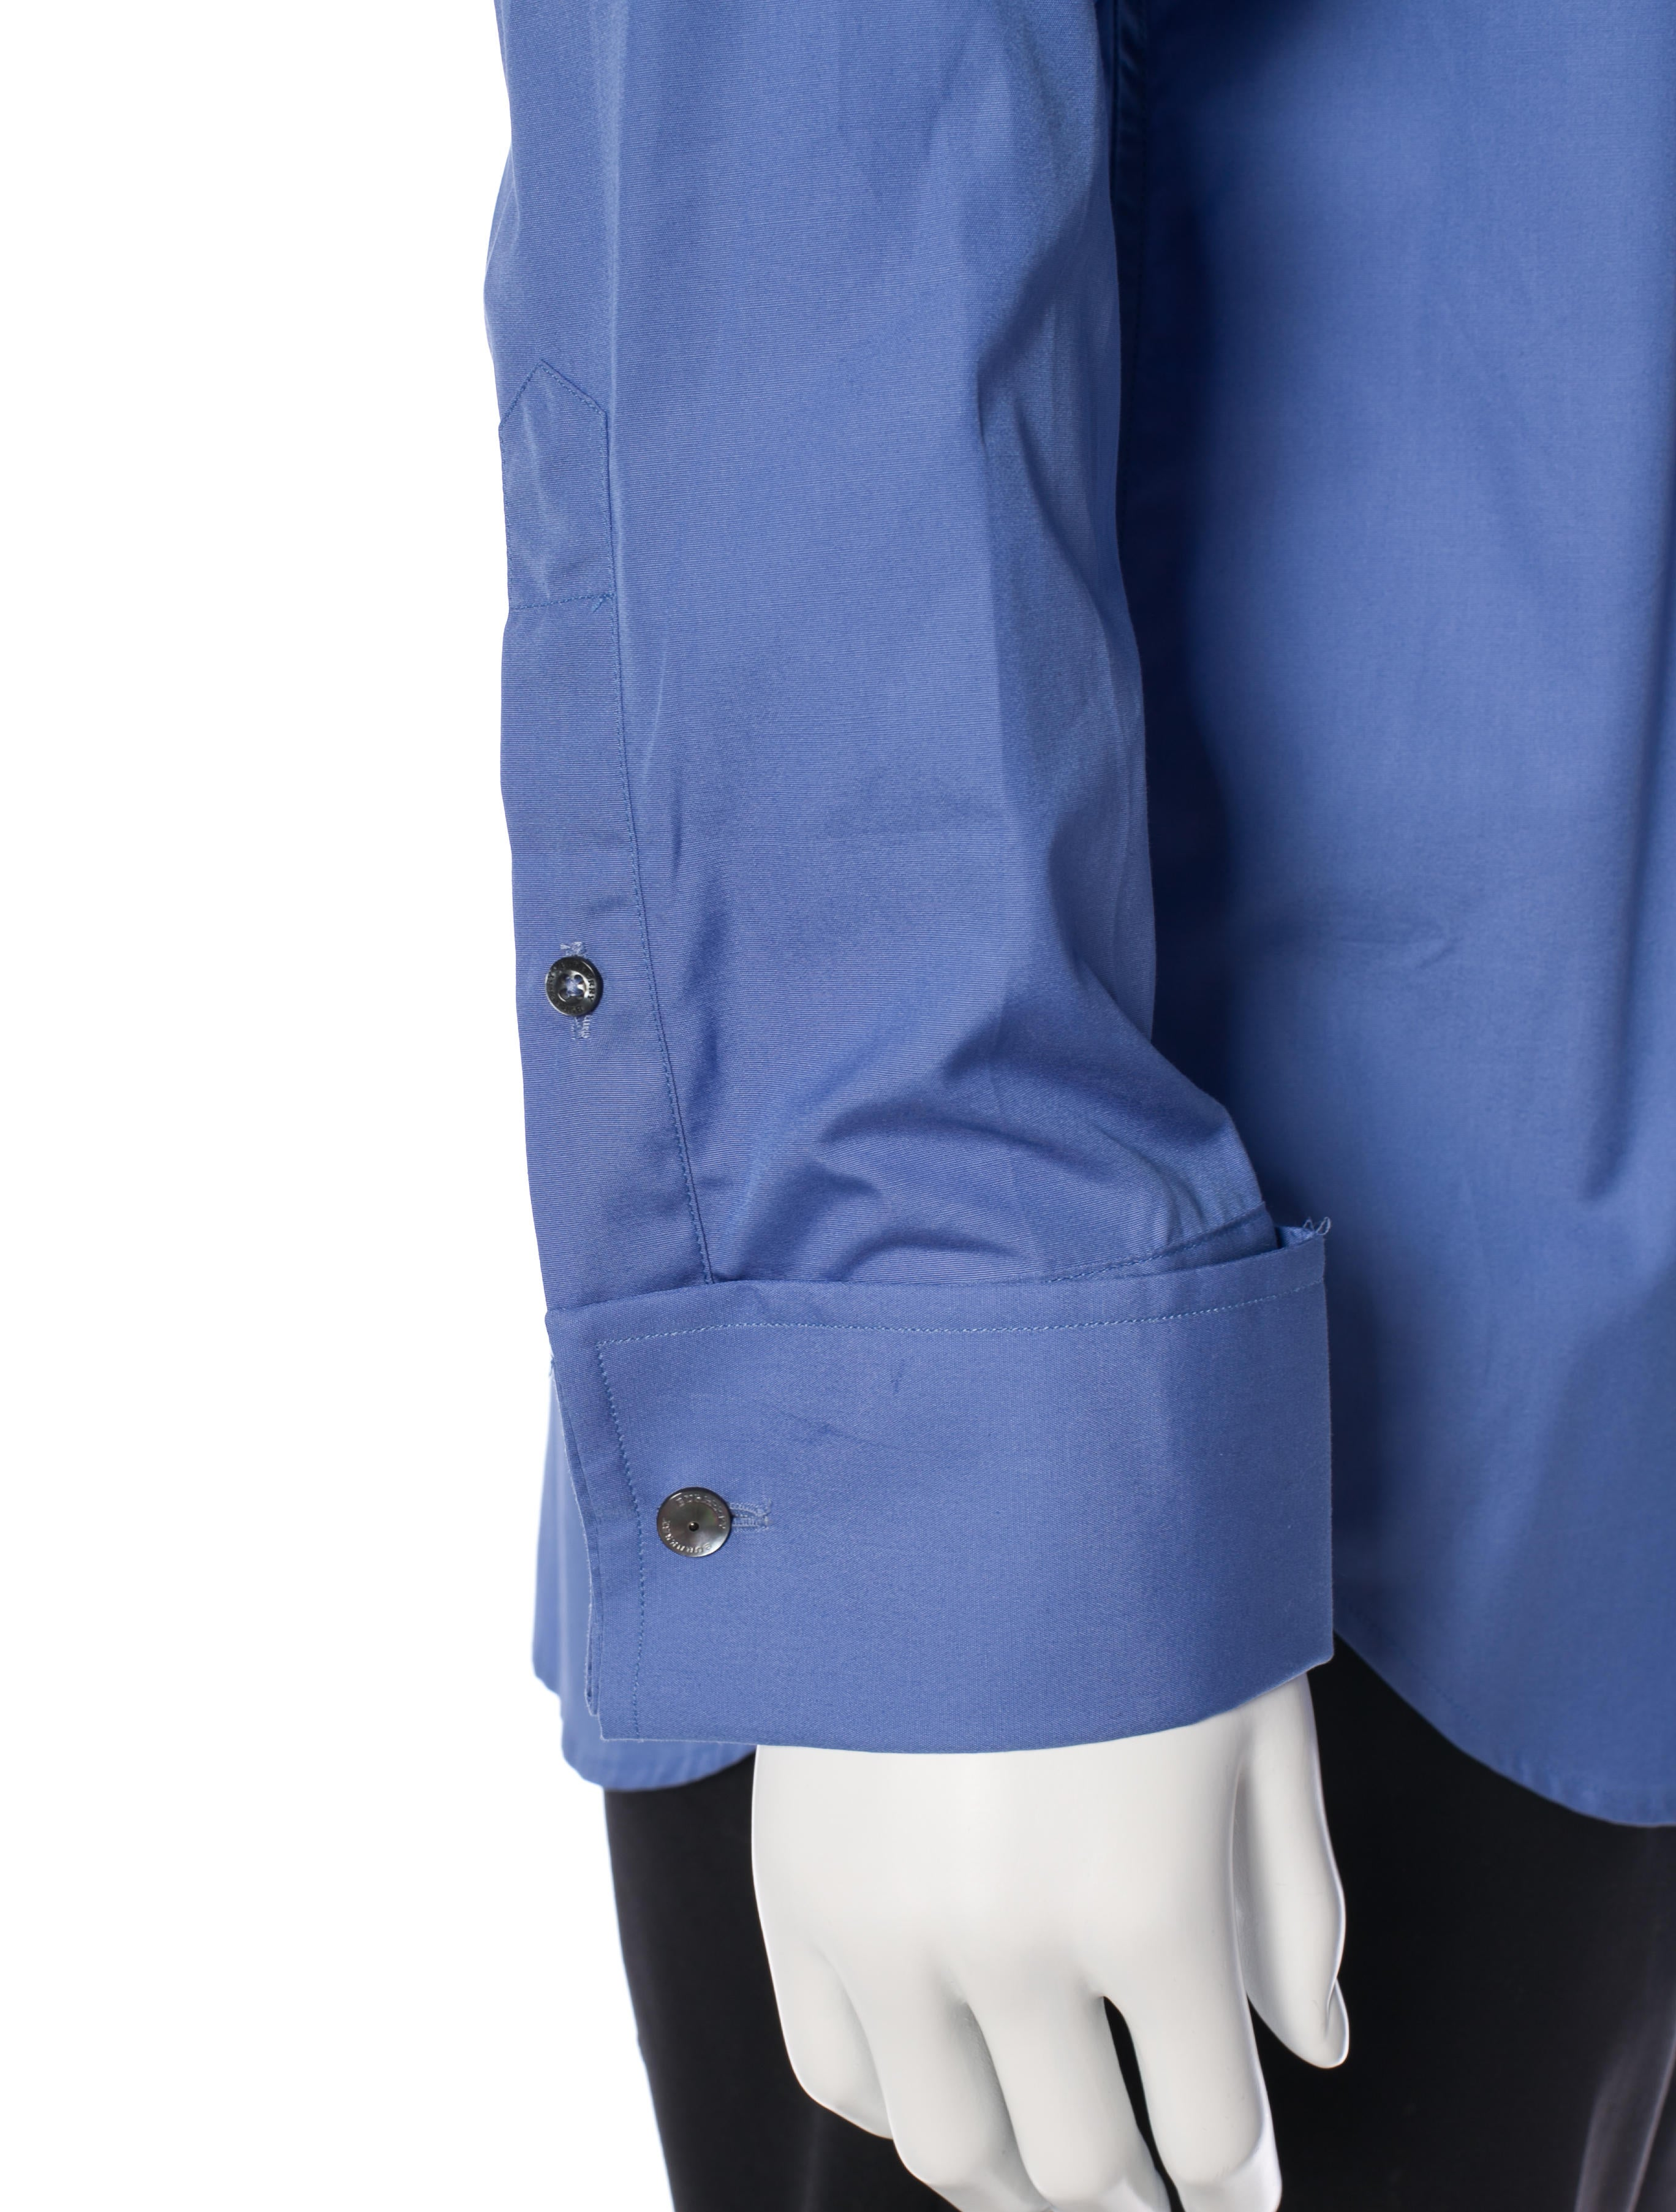 Burberry london french cuff dress shirt clothing for Dress shirt french cuffs